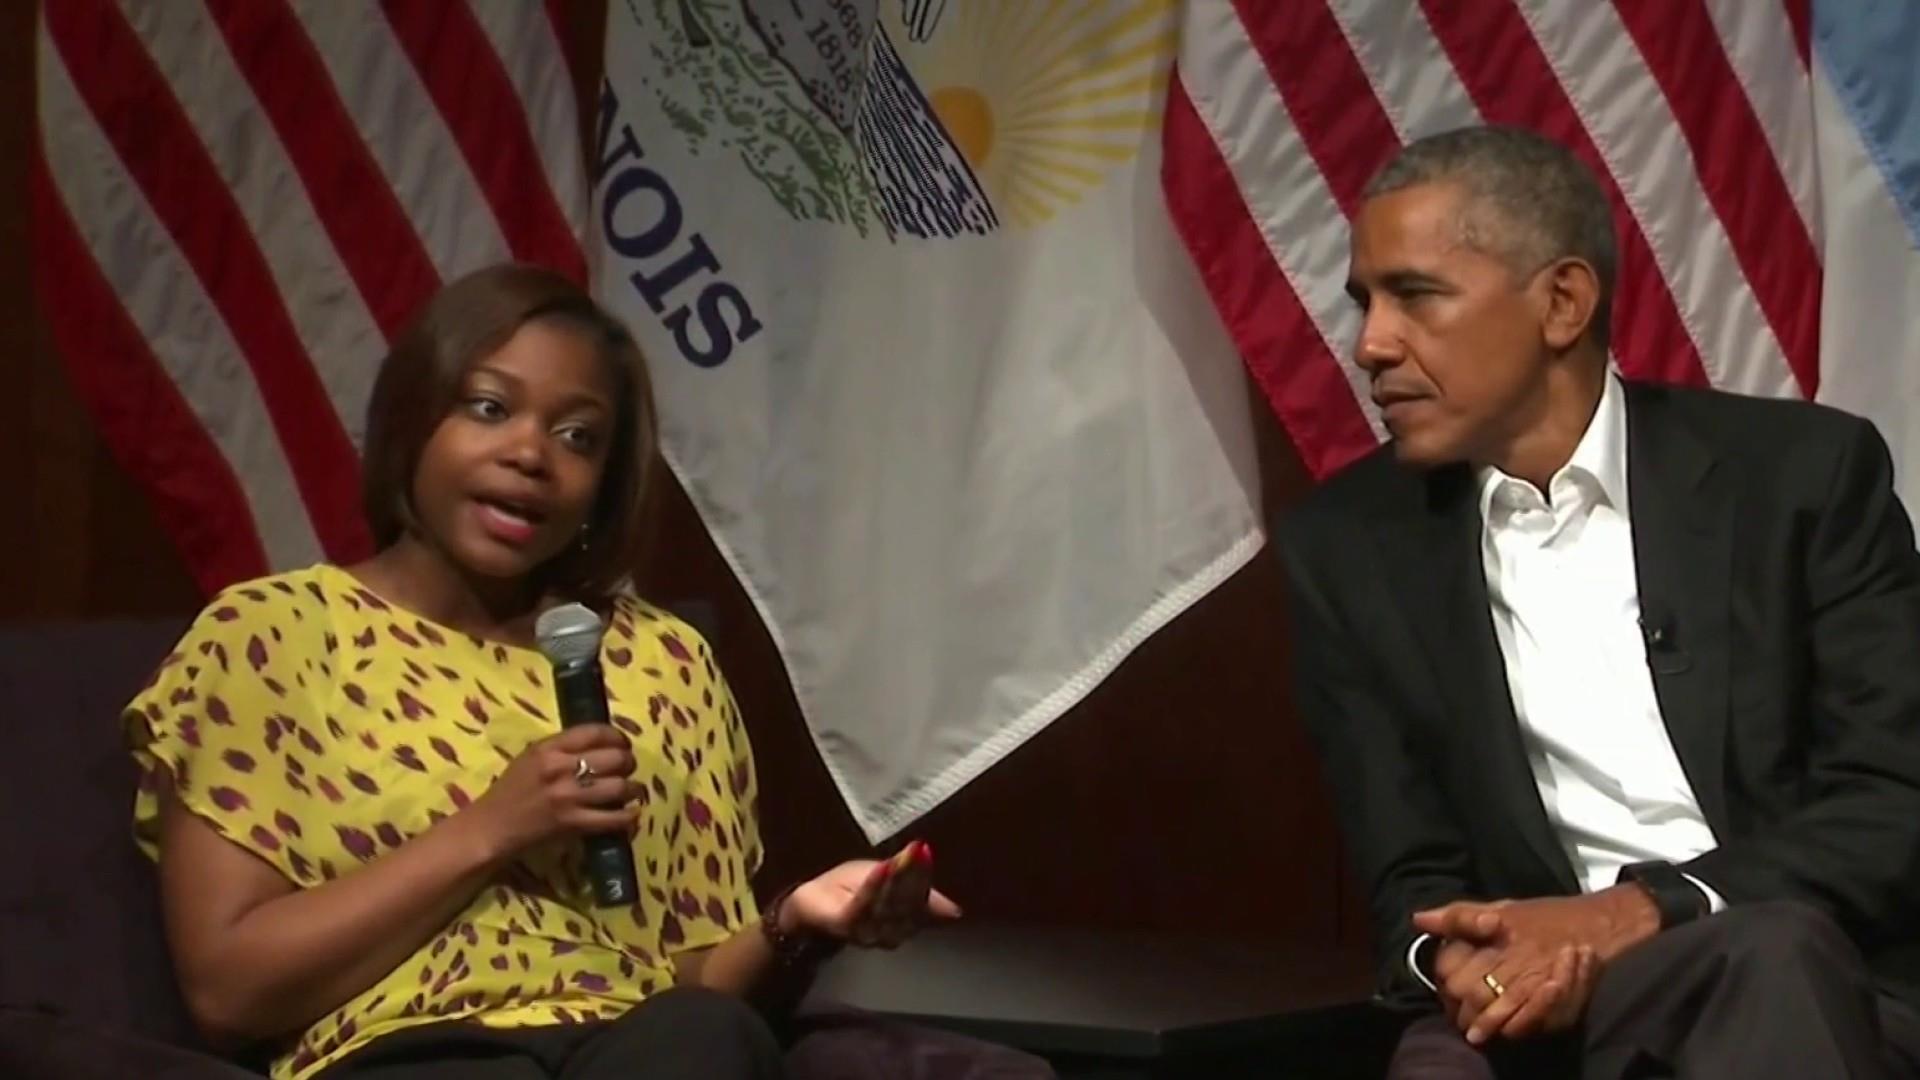 Obama set to kick off midterm campaign push